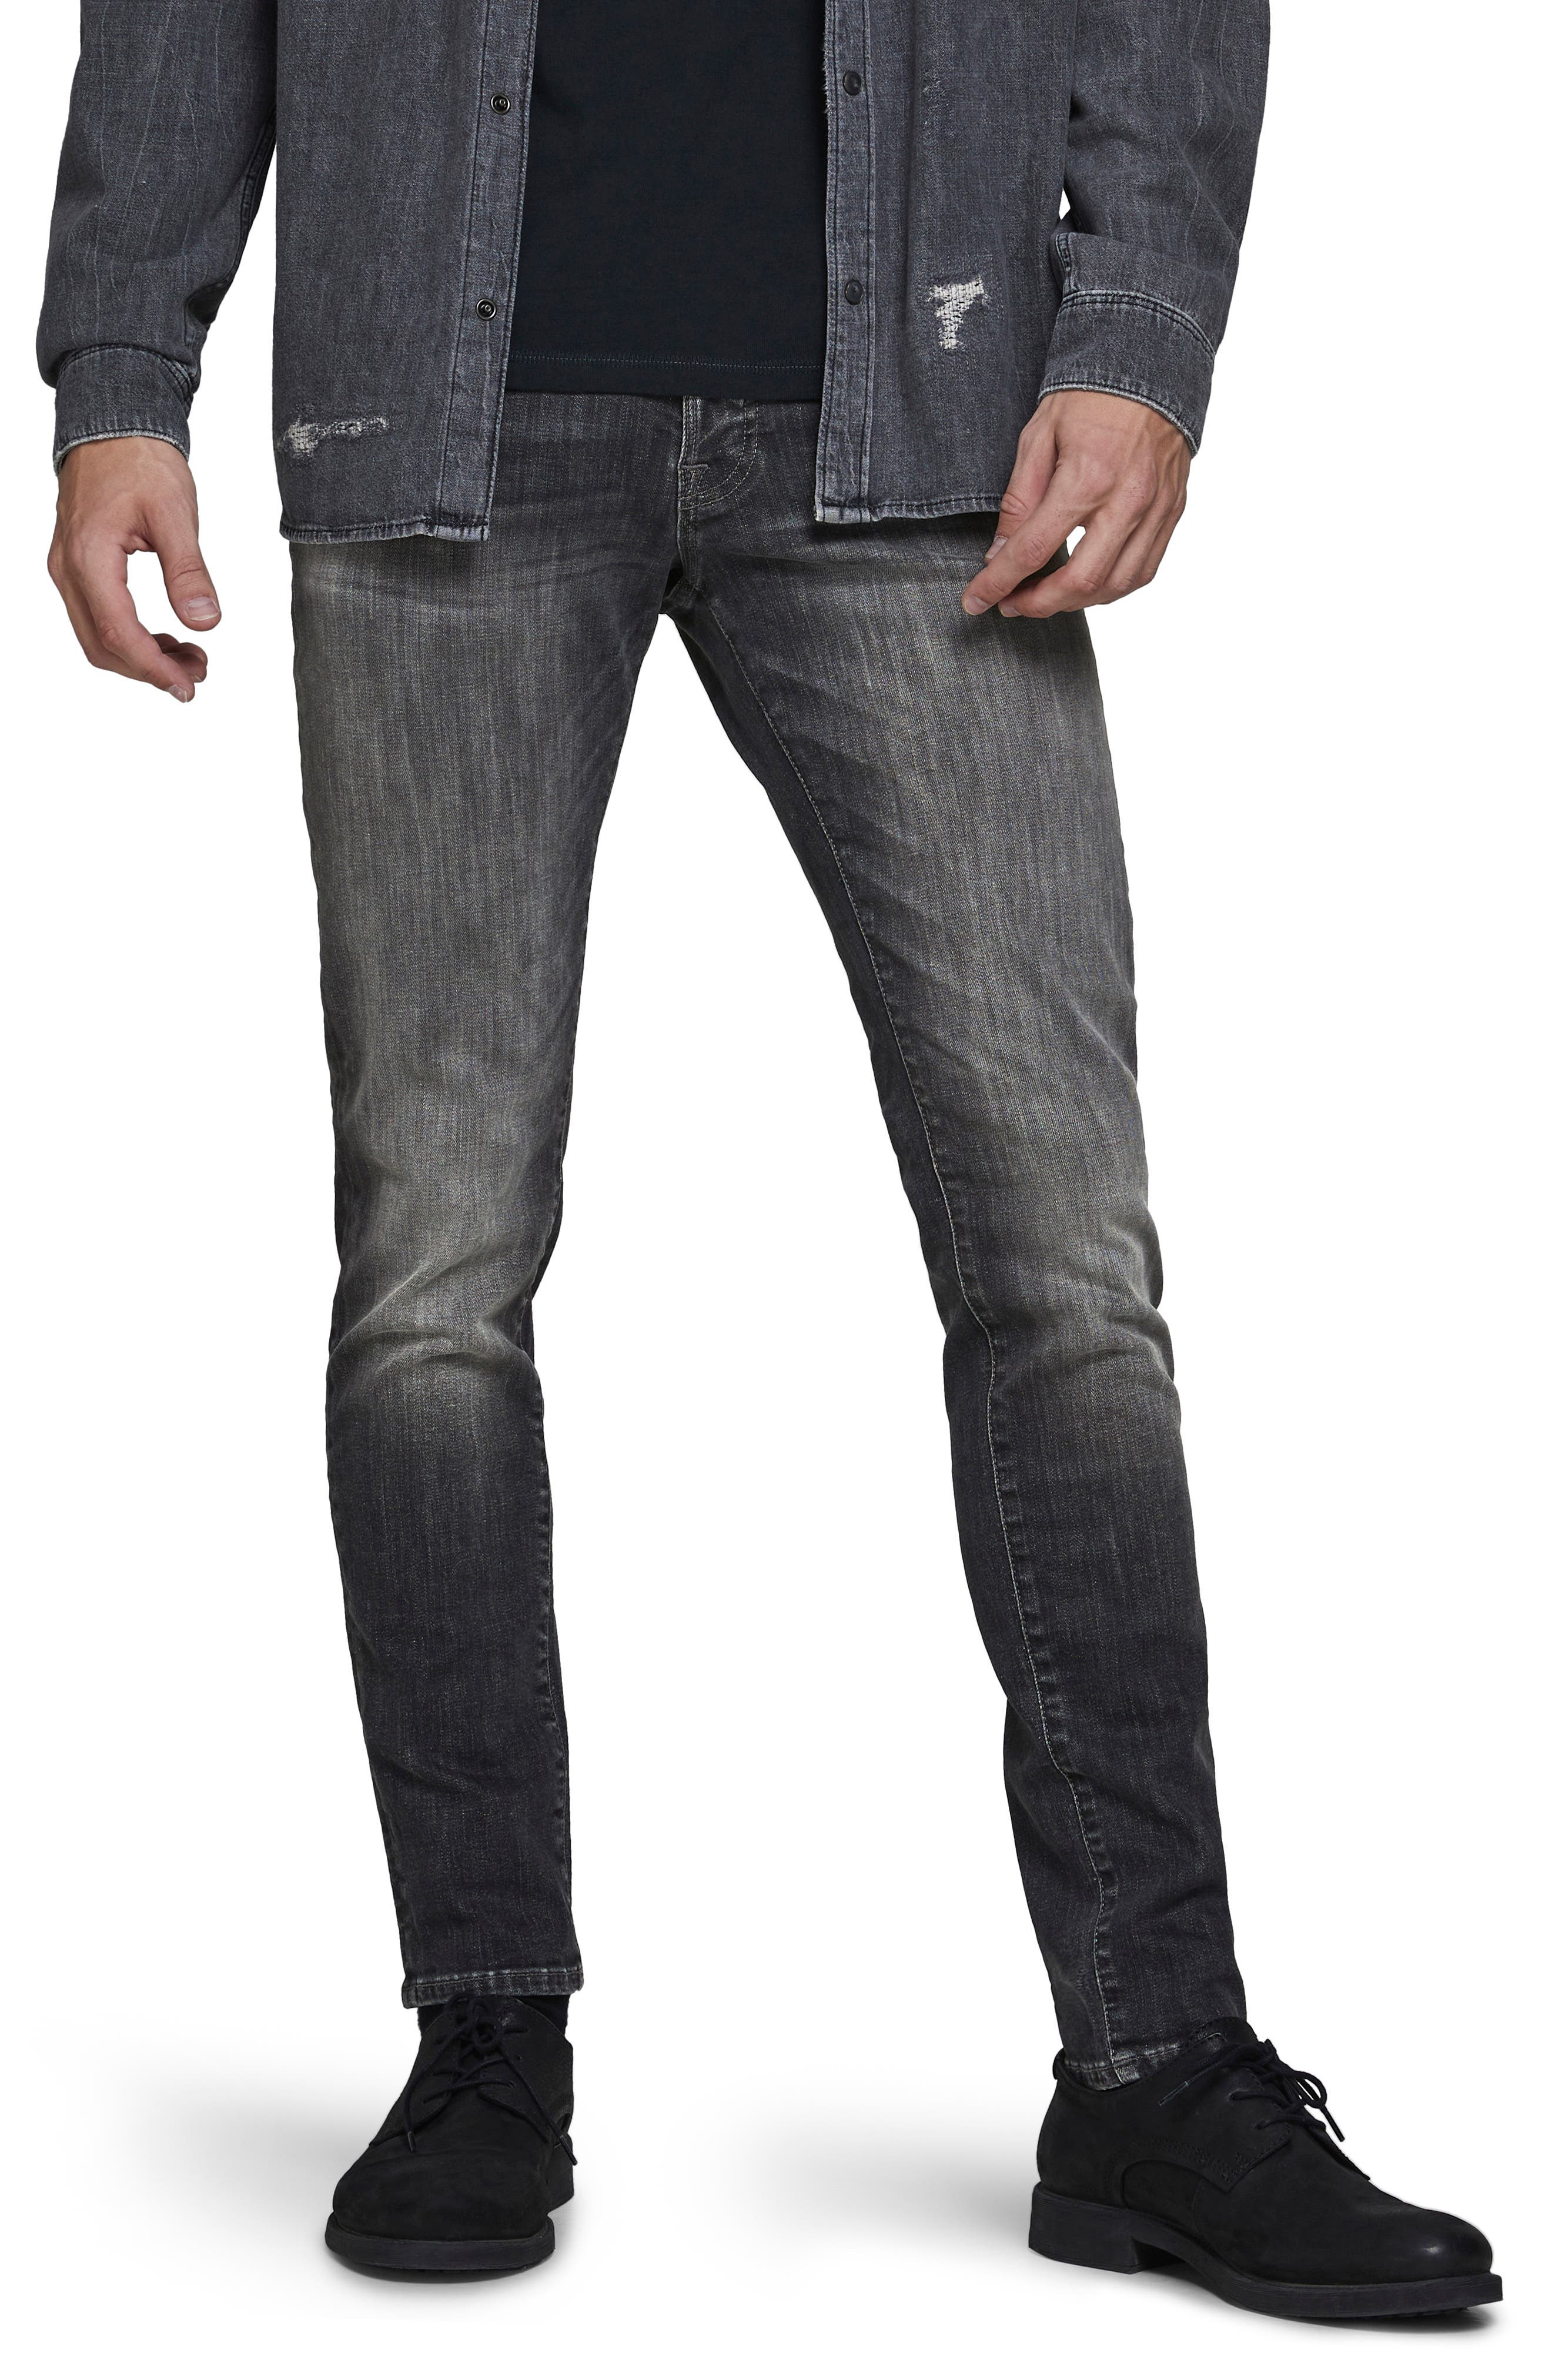 Glenn Fox Agi 304 50Sps Slim Fit Jeans